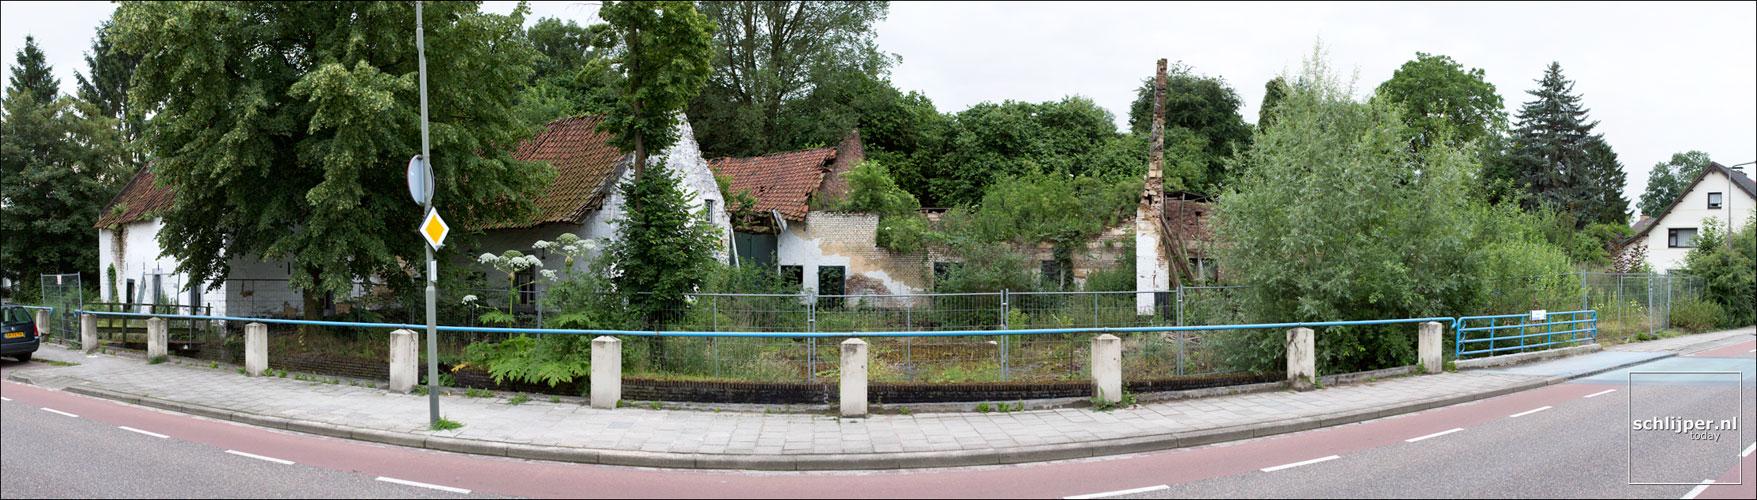 Nederland, Meerssen, 3 juli 2013